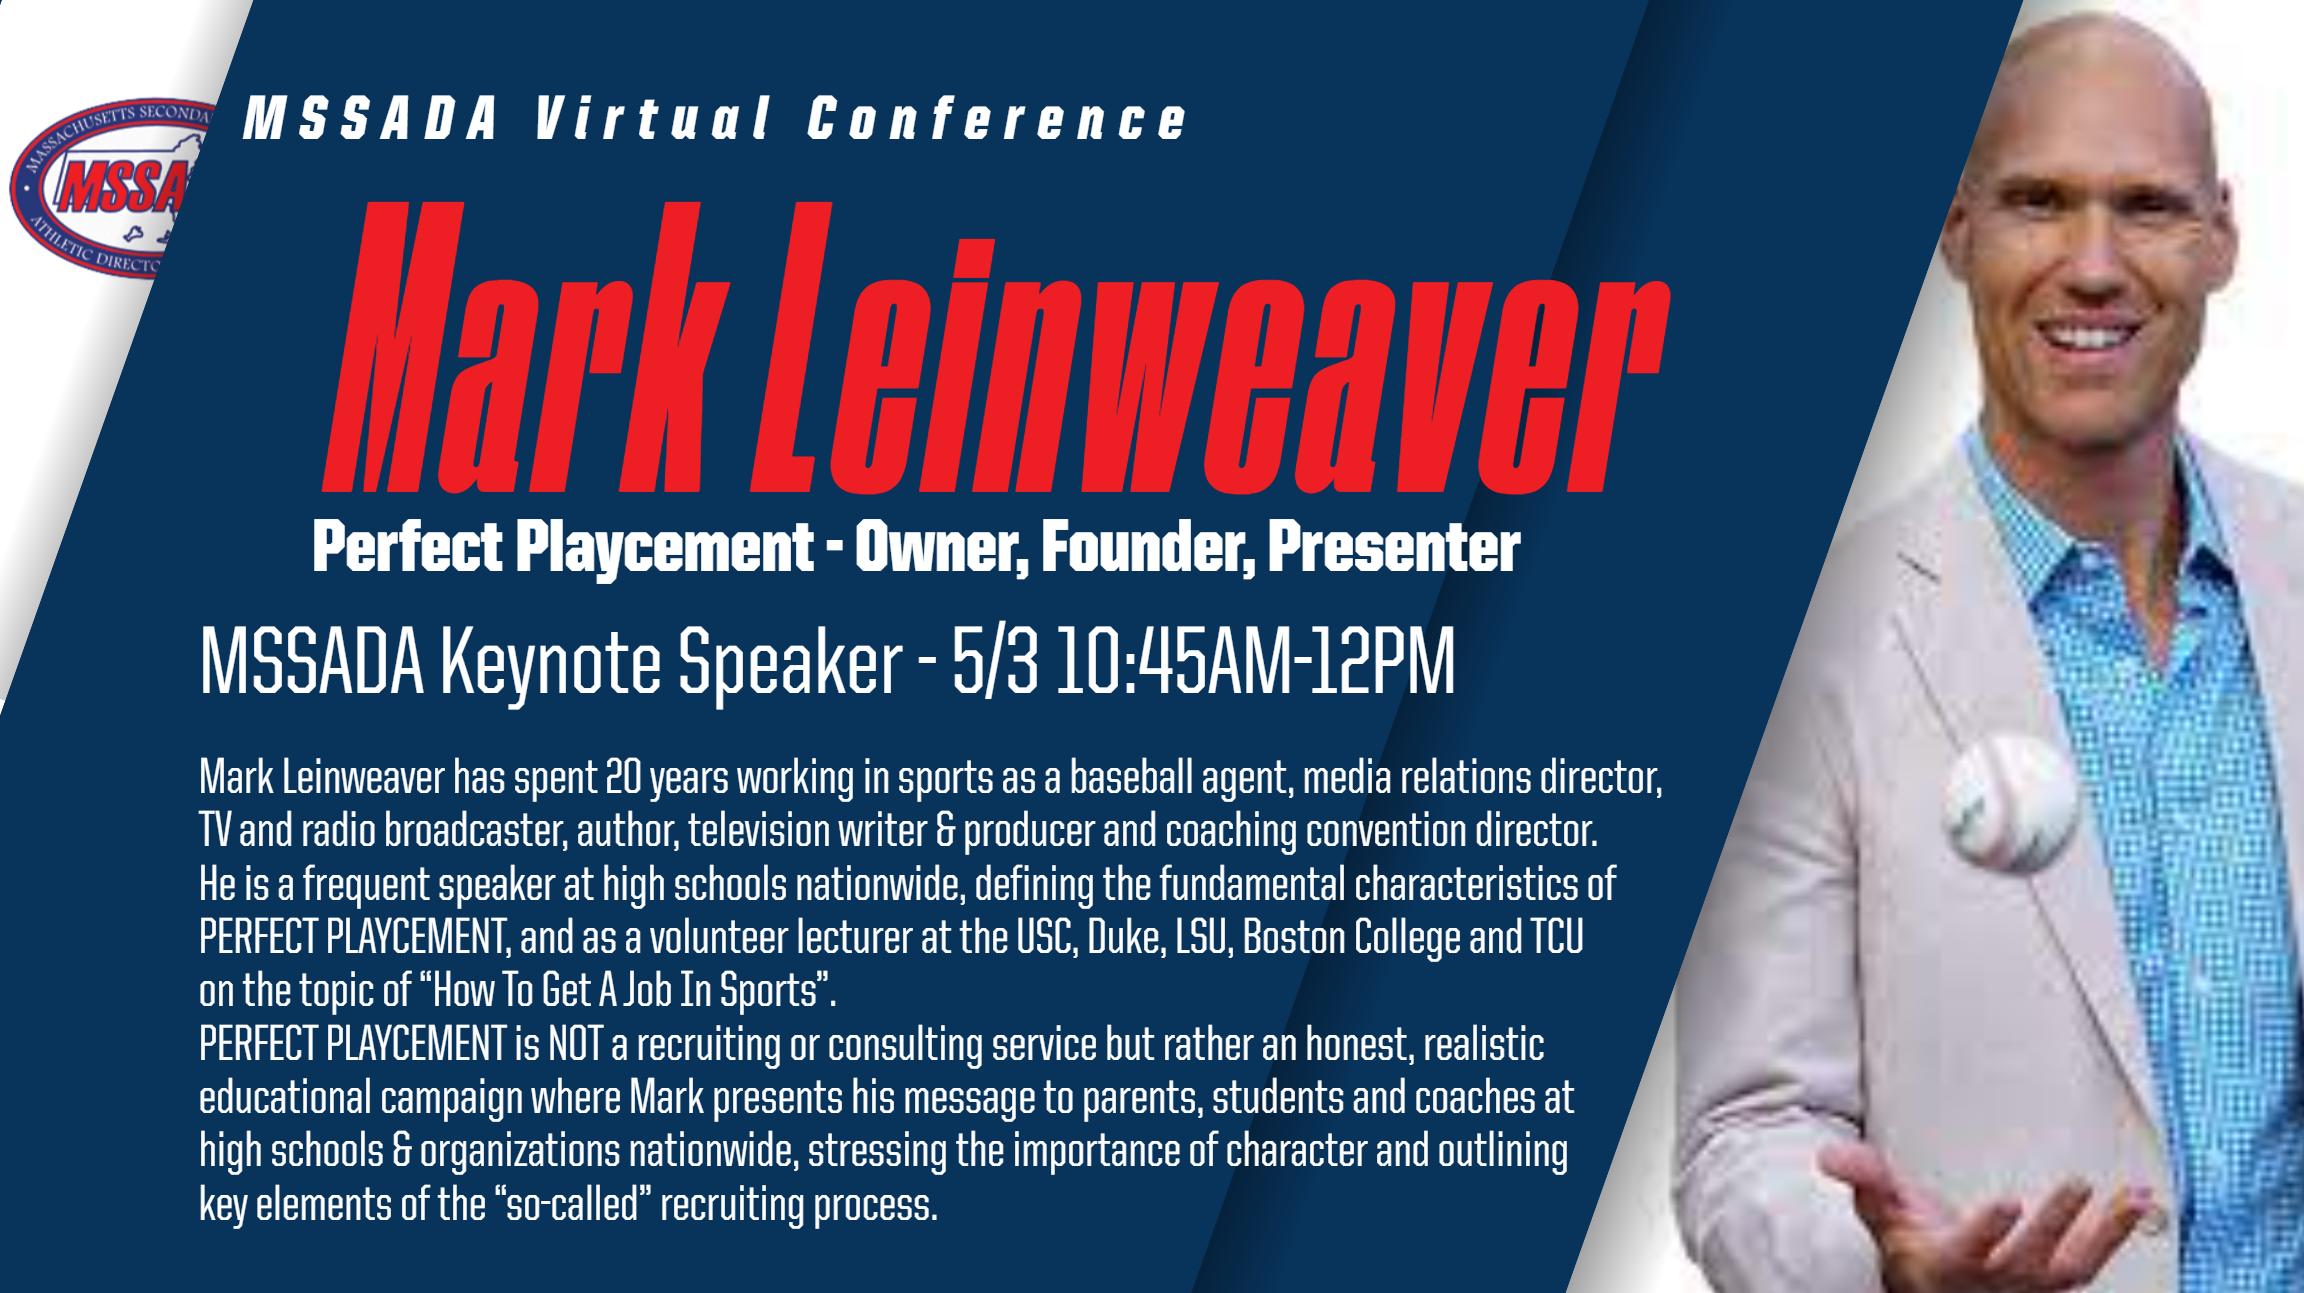 Keynote   -Mark Leinweaver PERFECT PLAYCEMENT